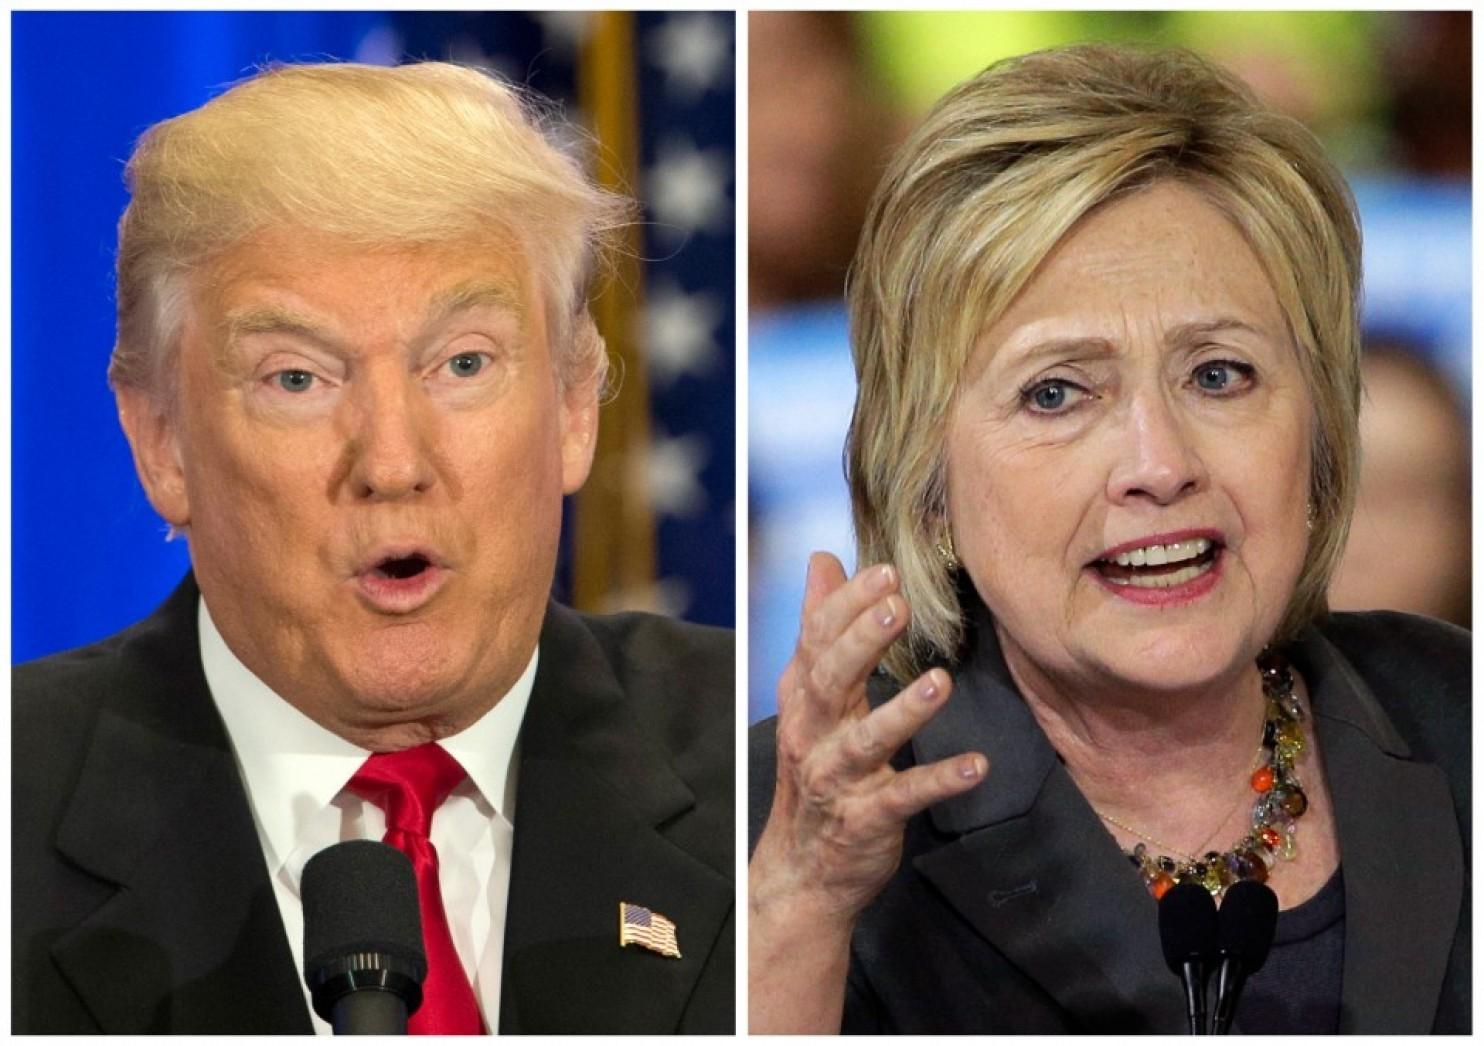 Hillary Clinton denies she is in ill health: WATCH